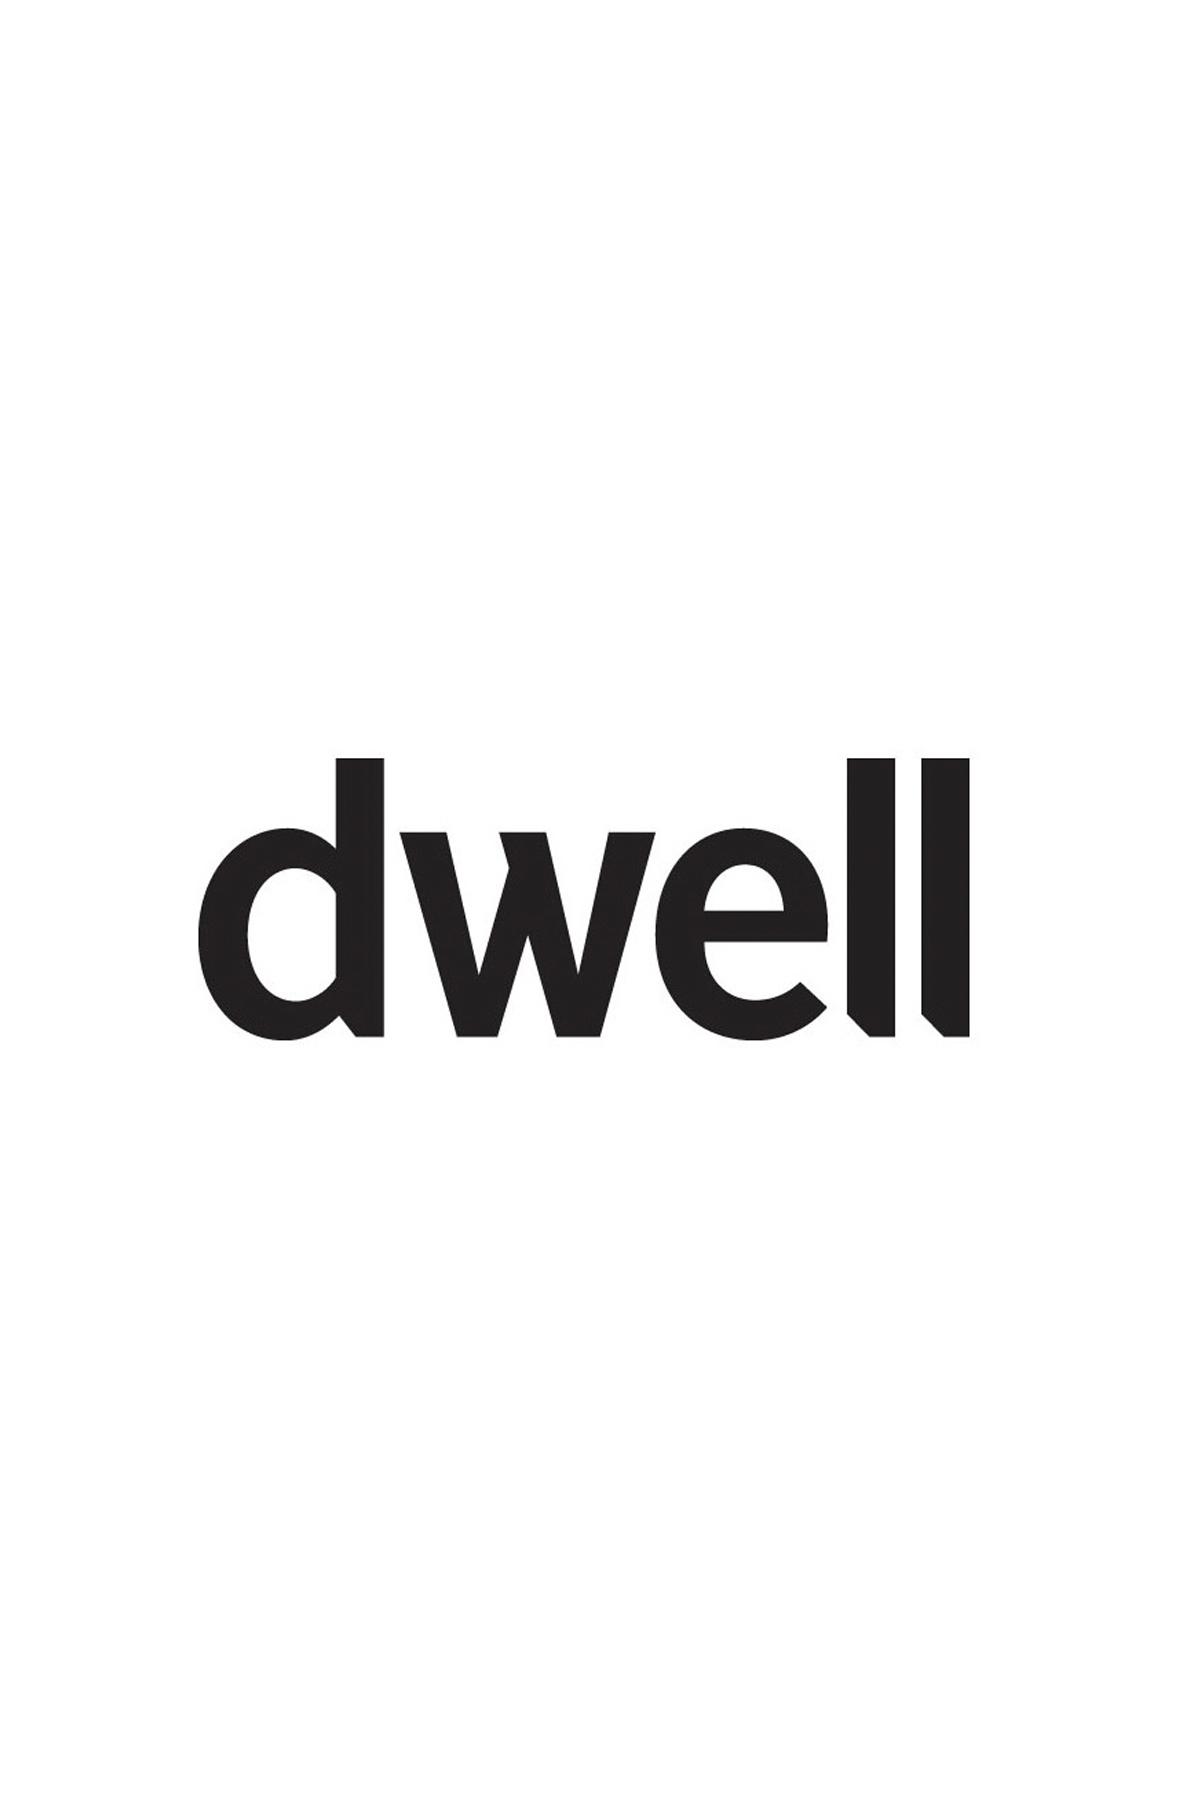 DwellLogo.jpg